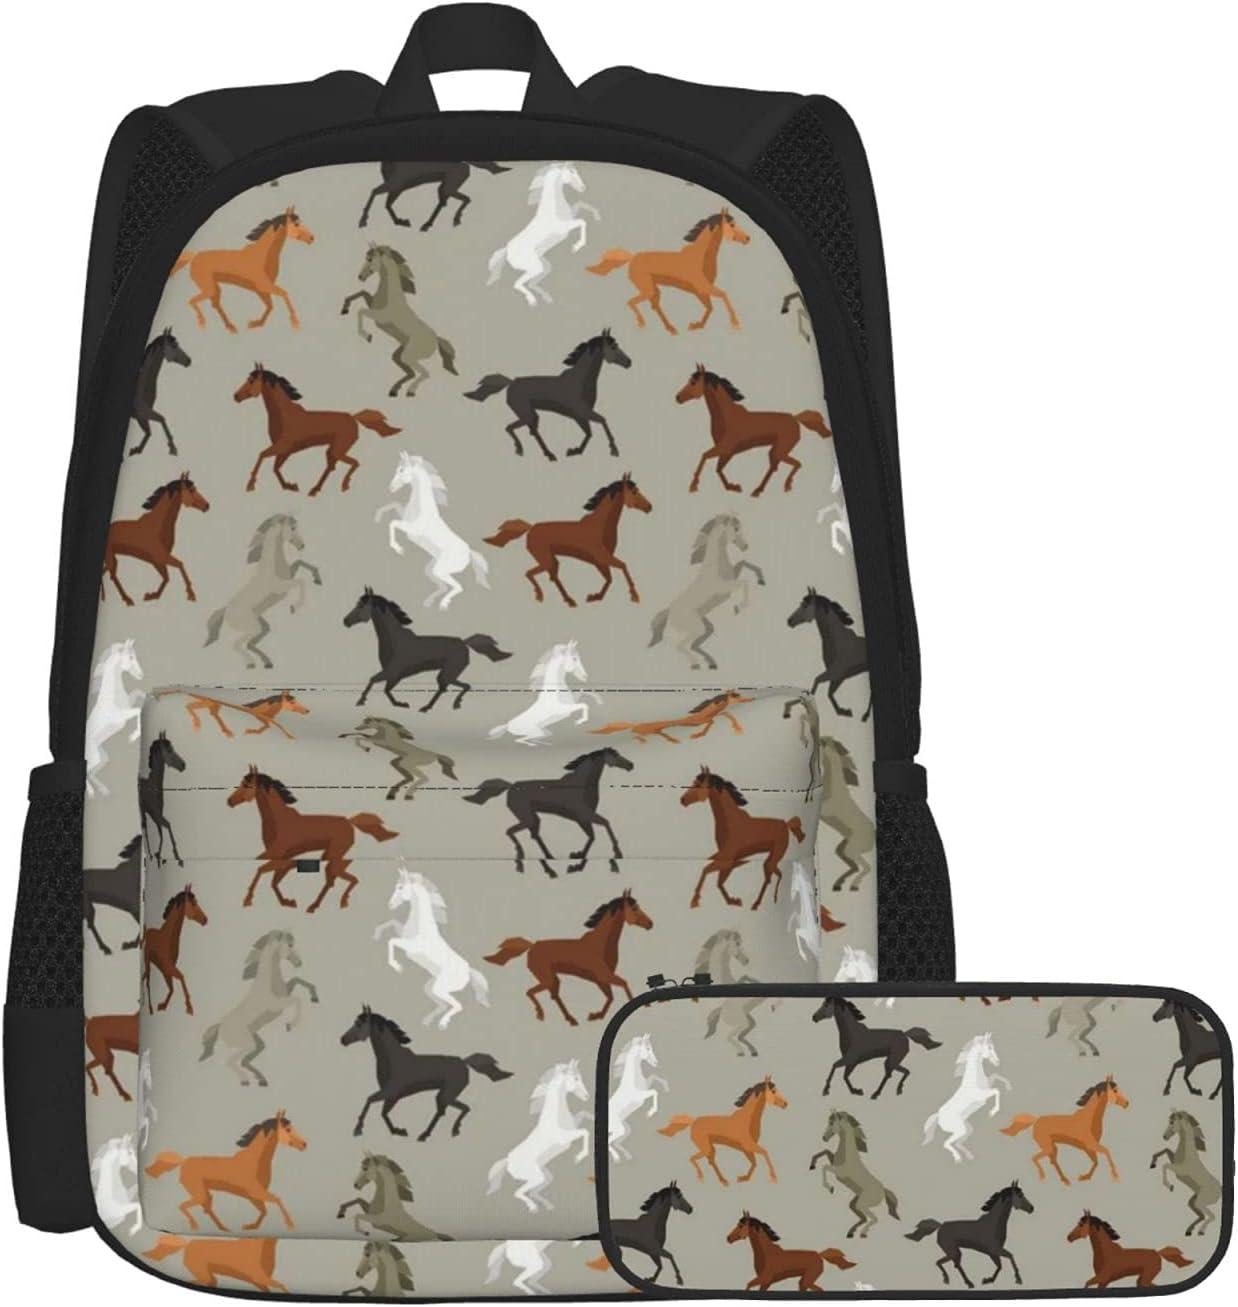 Horses Dedication Two-Piece Max 54% OFF Set Casual School Bookbag With Pencil Box Case